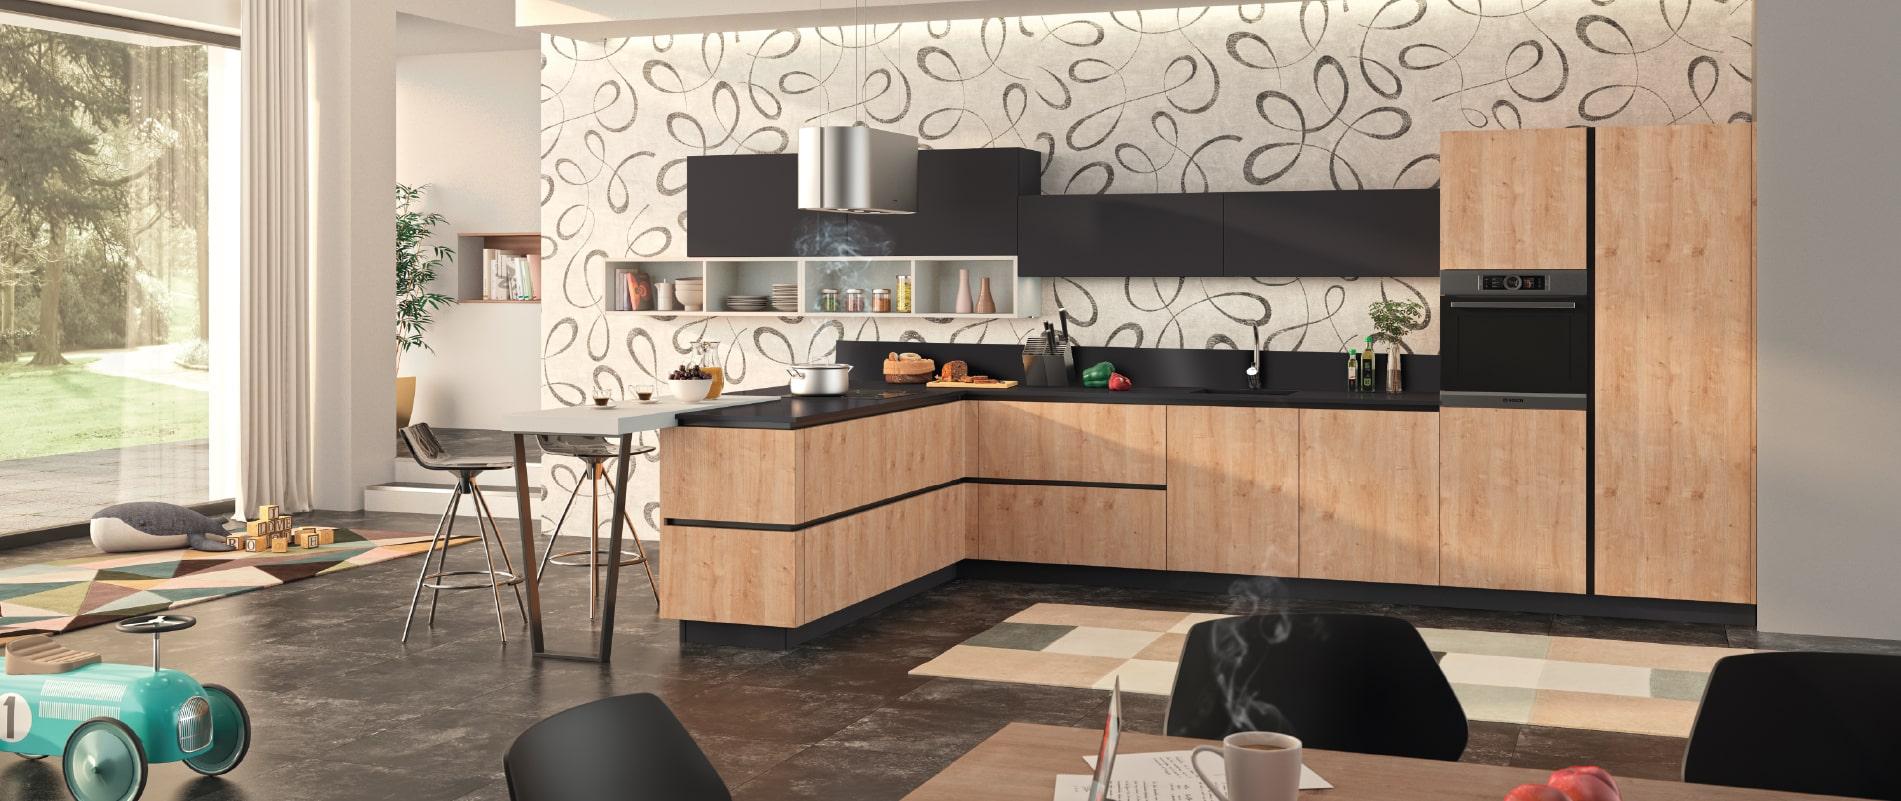 Cuisines MOREL  Cuisiniste Fabricant surmesure Marque haut de gamme franaise